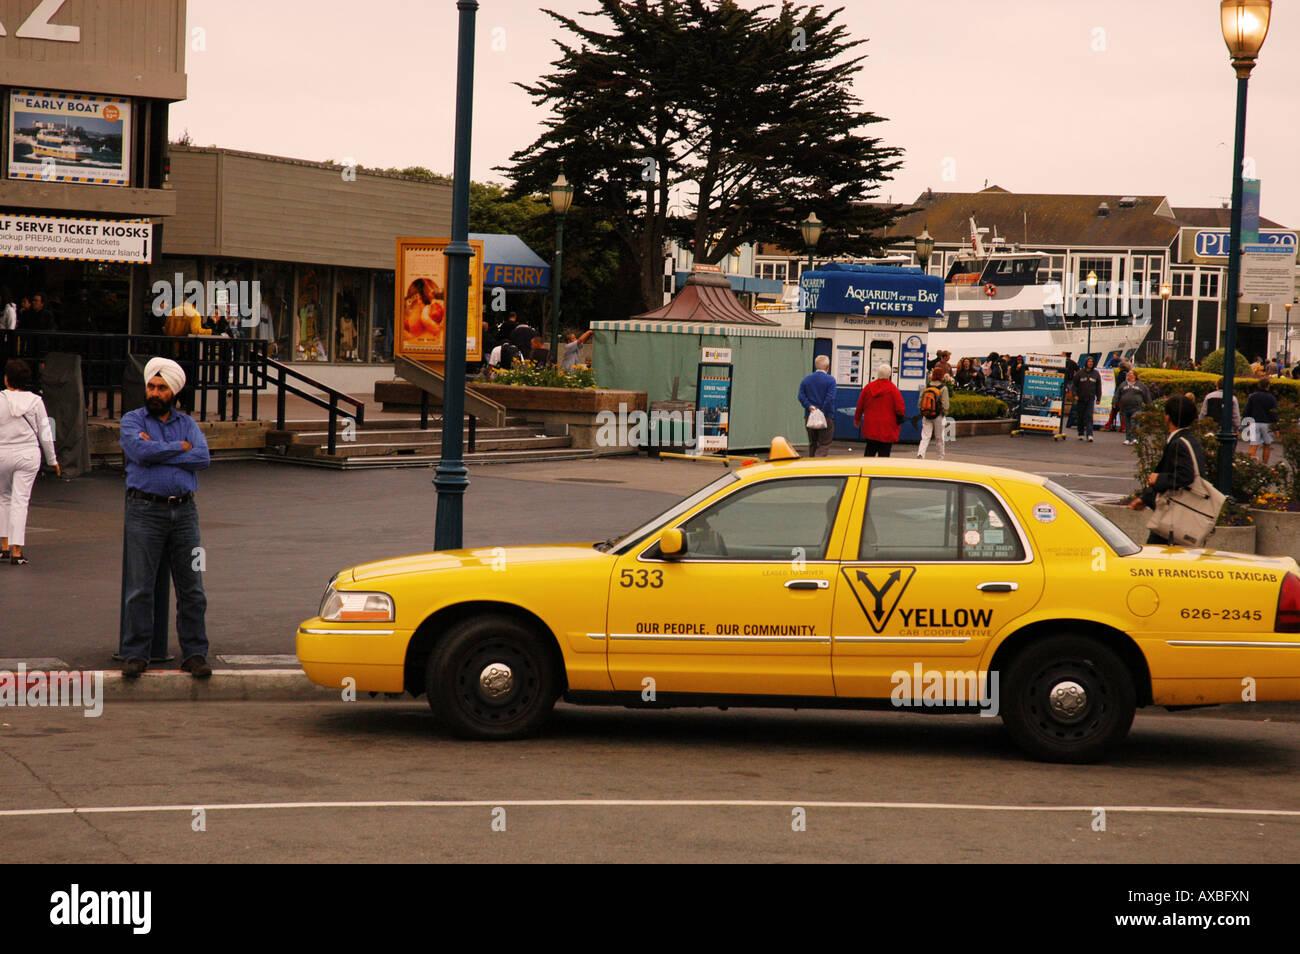 Indian taxi driver in Fisherman's Wharf di San Francisco Stati Uniti d'America Immagini Stock